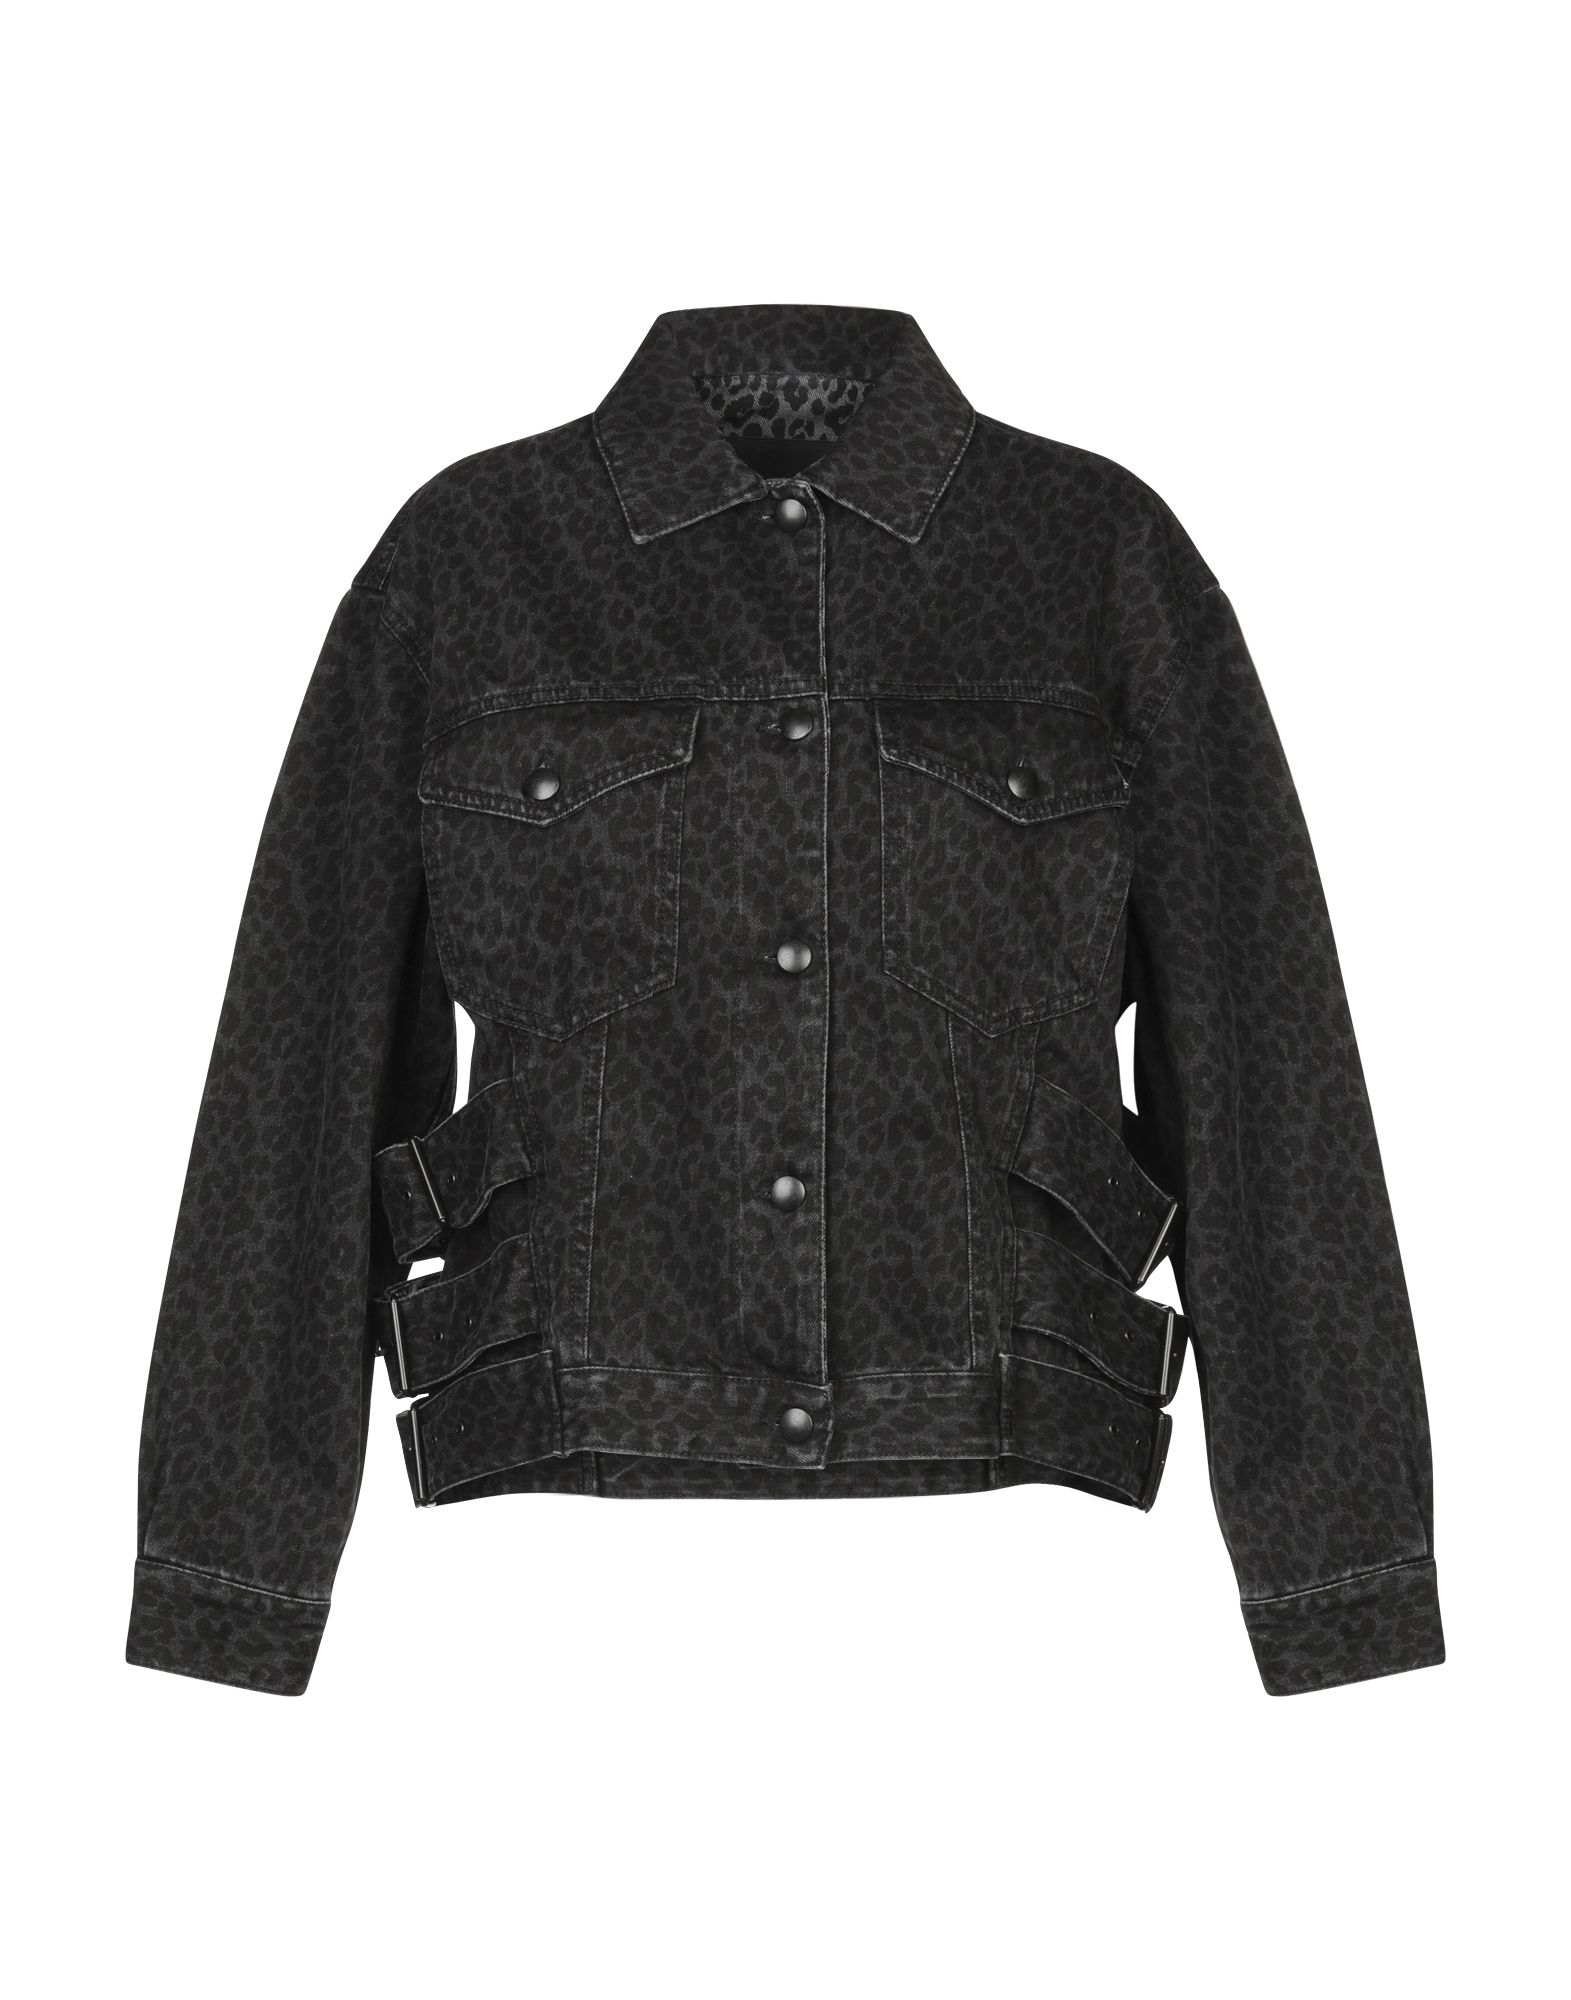 McQ Alexander McQueen Denim outerwear - Item 42779986